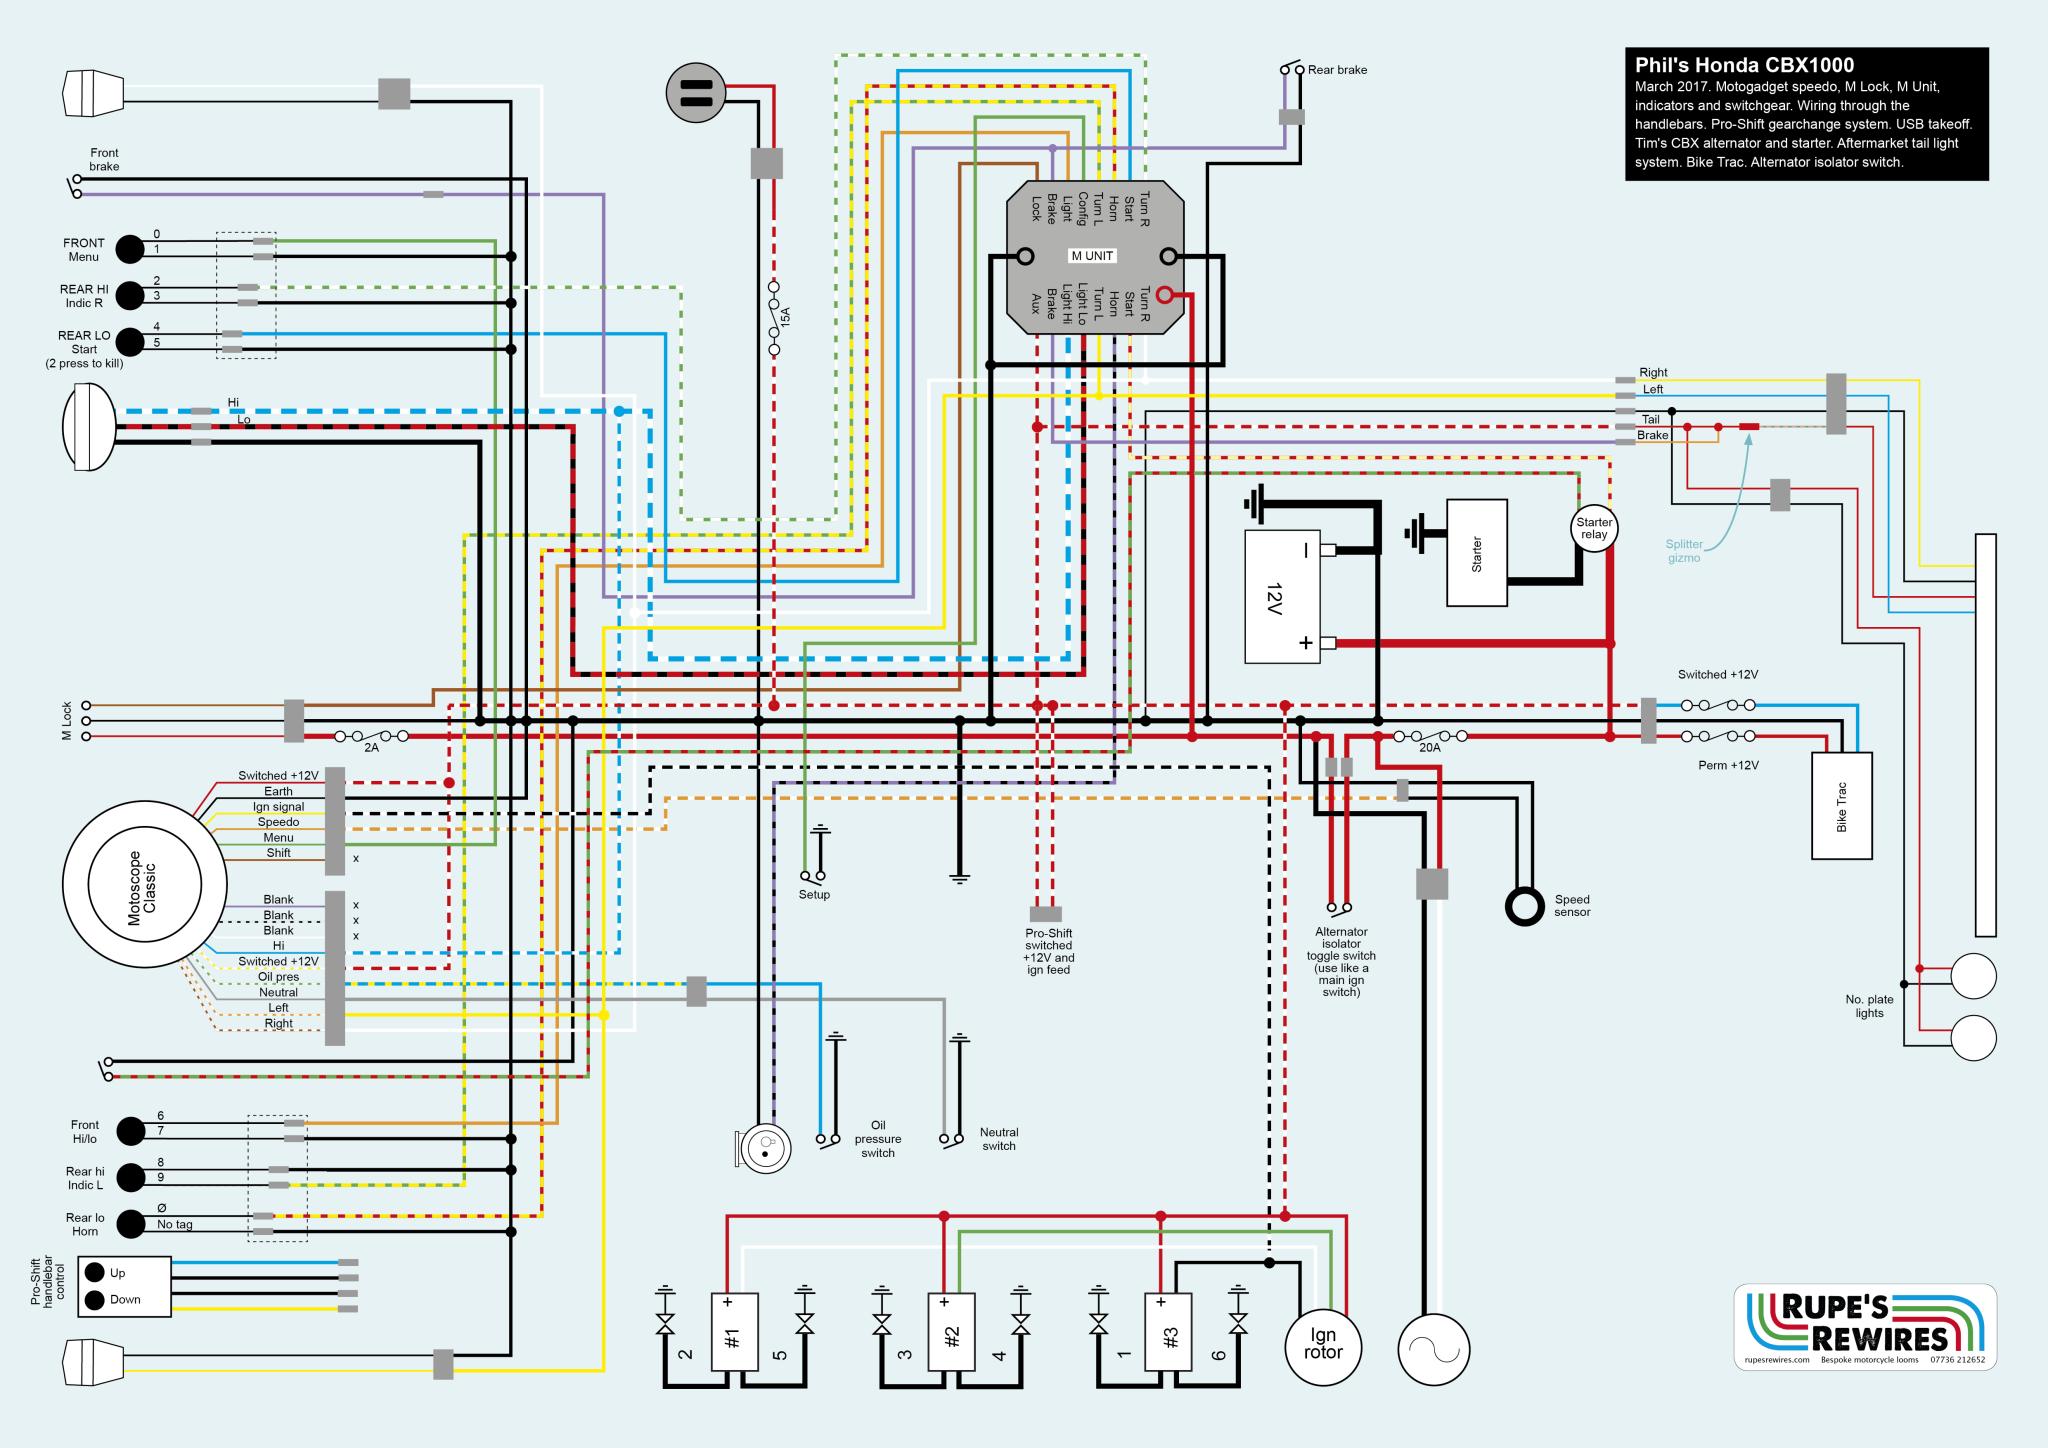 Honda Cbx Wiring Schematic Diagrams 2012 Cr V Diagram Phil S Cbx1000 Rupe Rewires 550